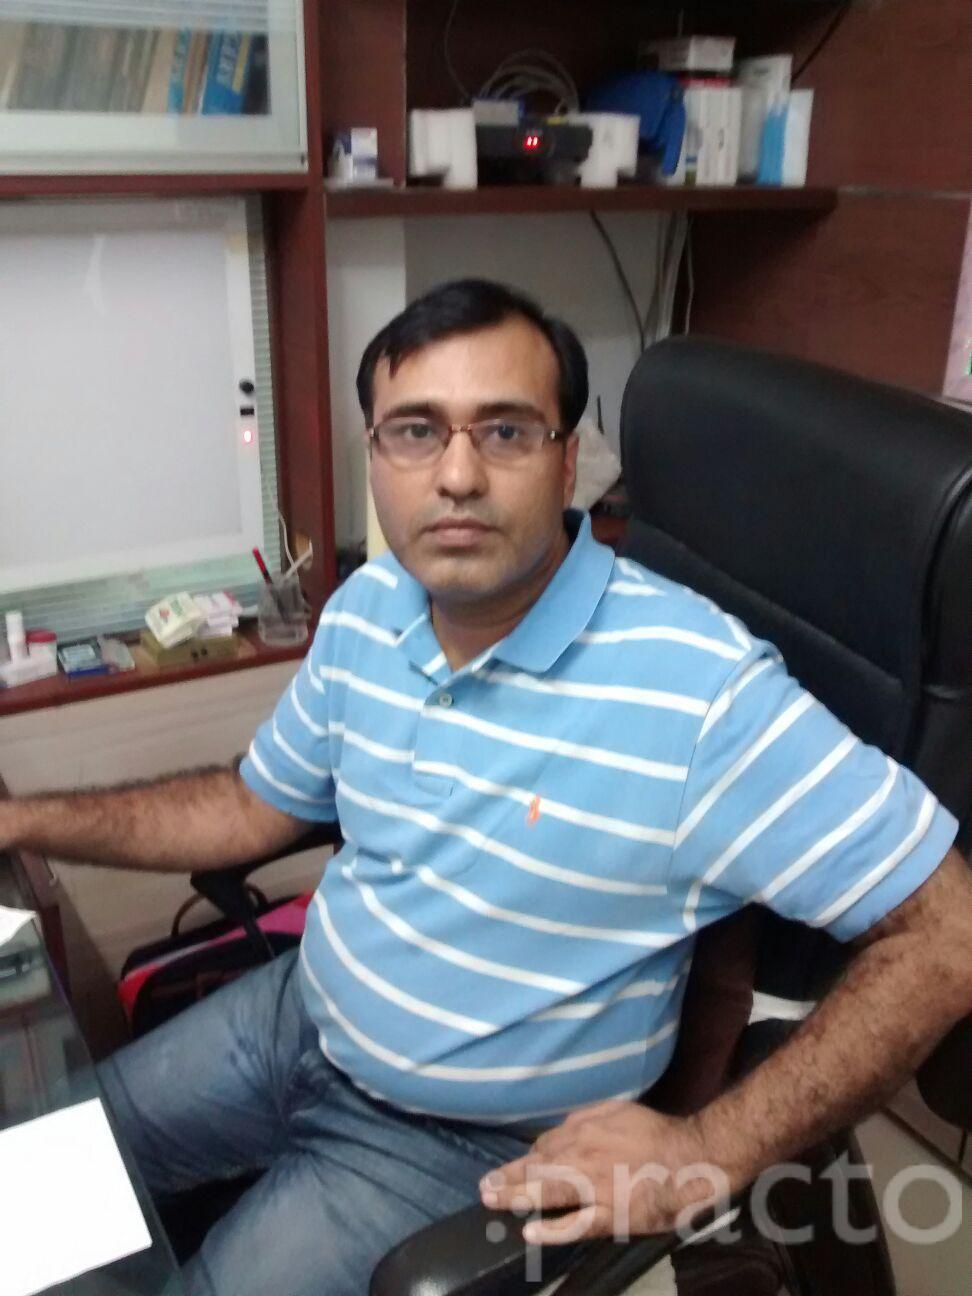 Dr. Janak Sadhwani - Laparoscopic Surgeon